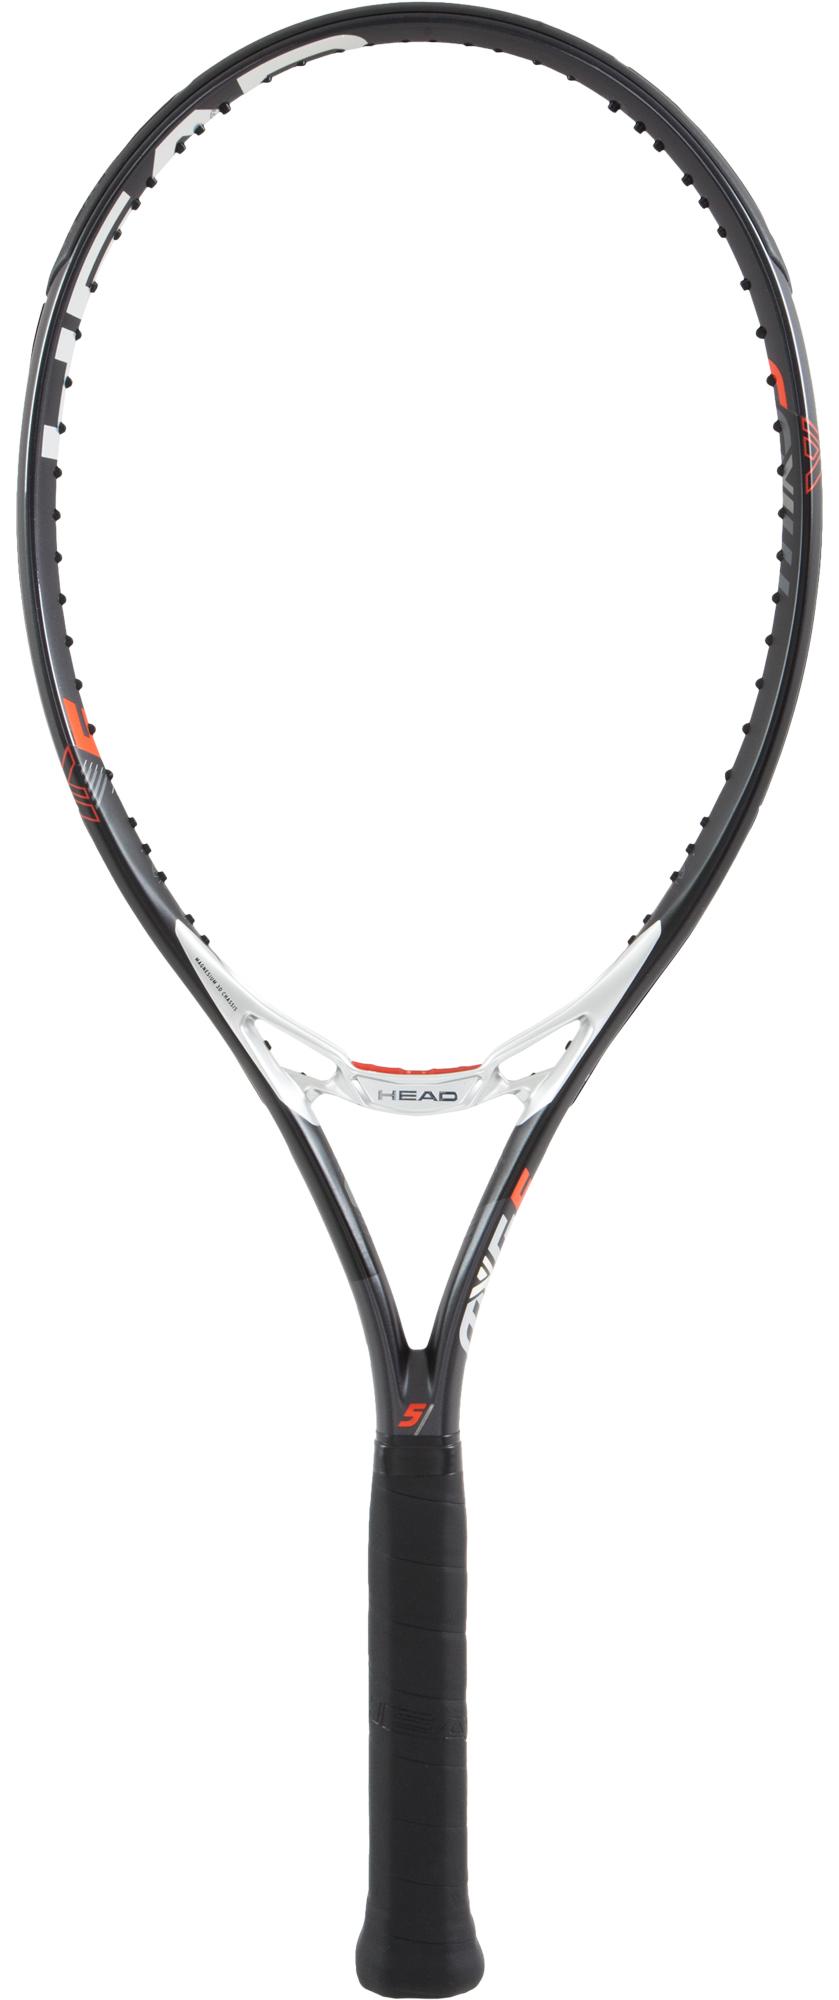 Head Ракетка для большого тенниса Head MXG 5, размер 4 head ракетка для большого тенниса детская head novak 23 размер без размера